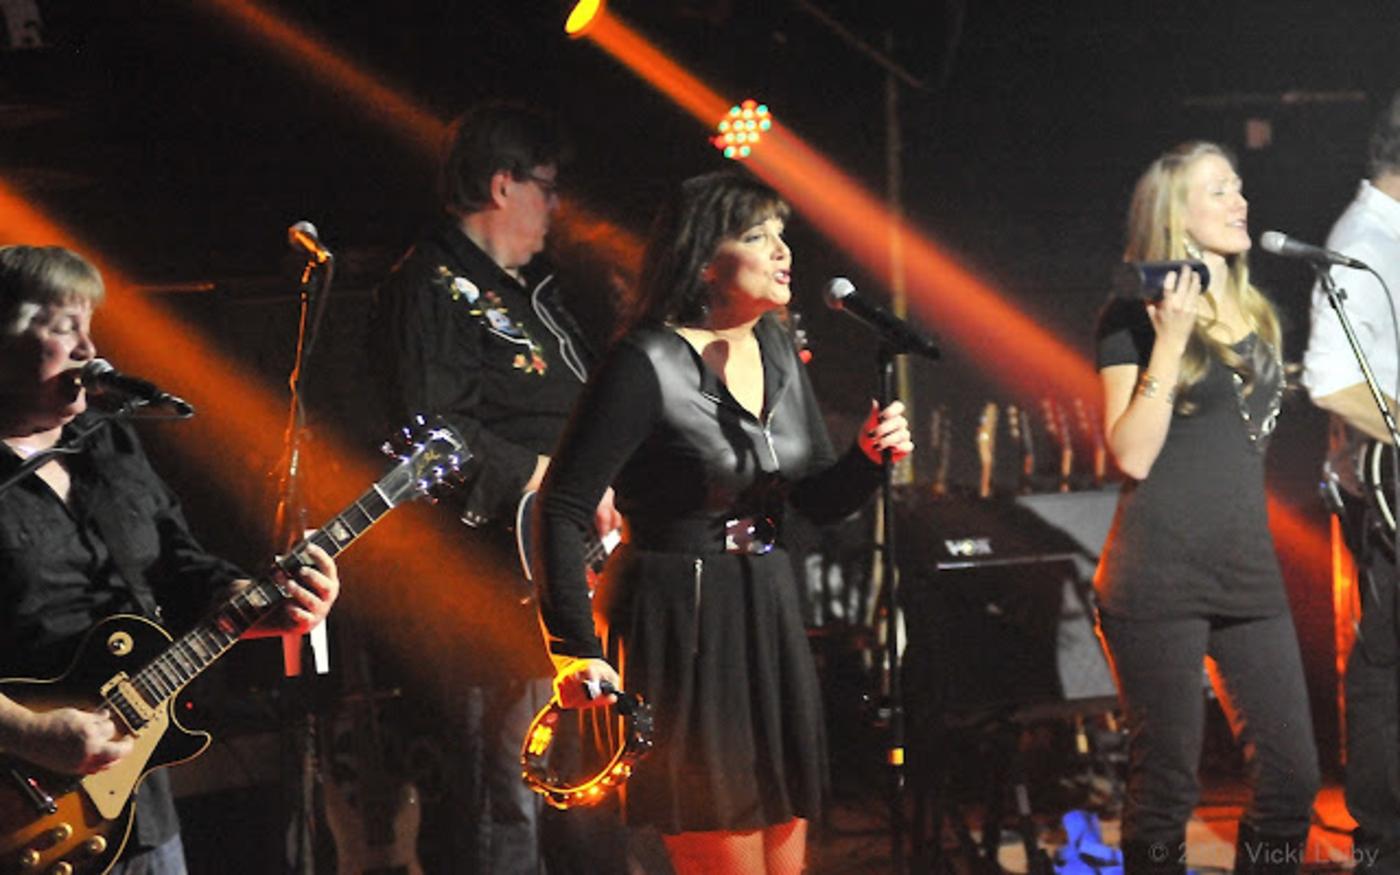 Rock Diva 700 Musician In Arlington Heights Il Bandmix Com